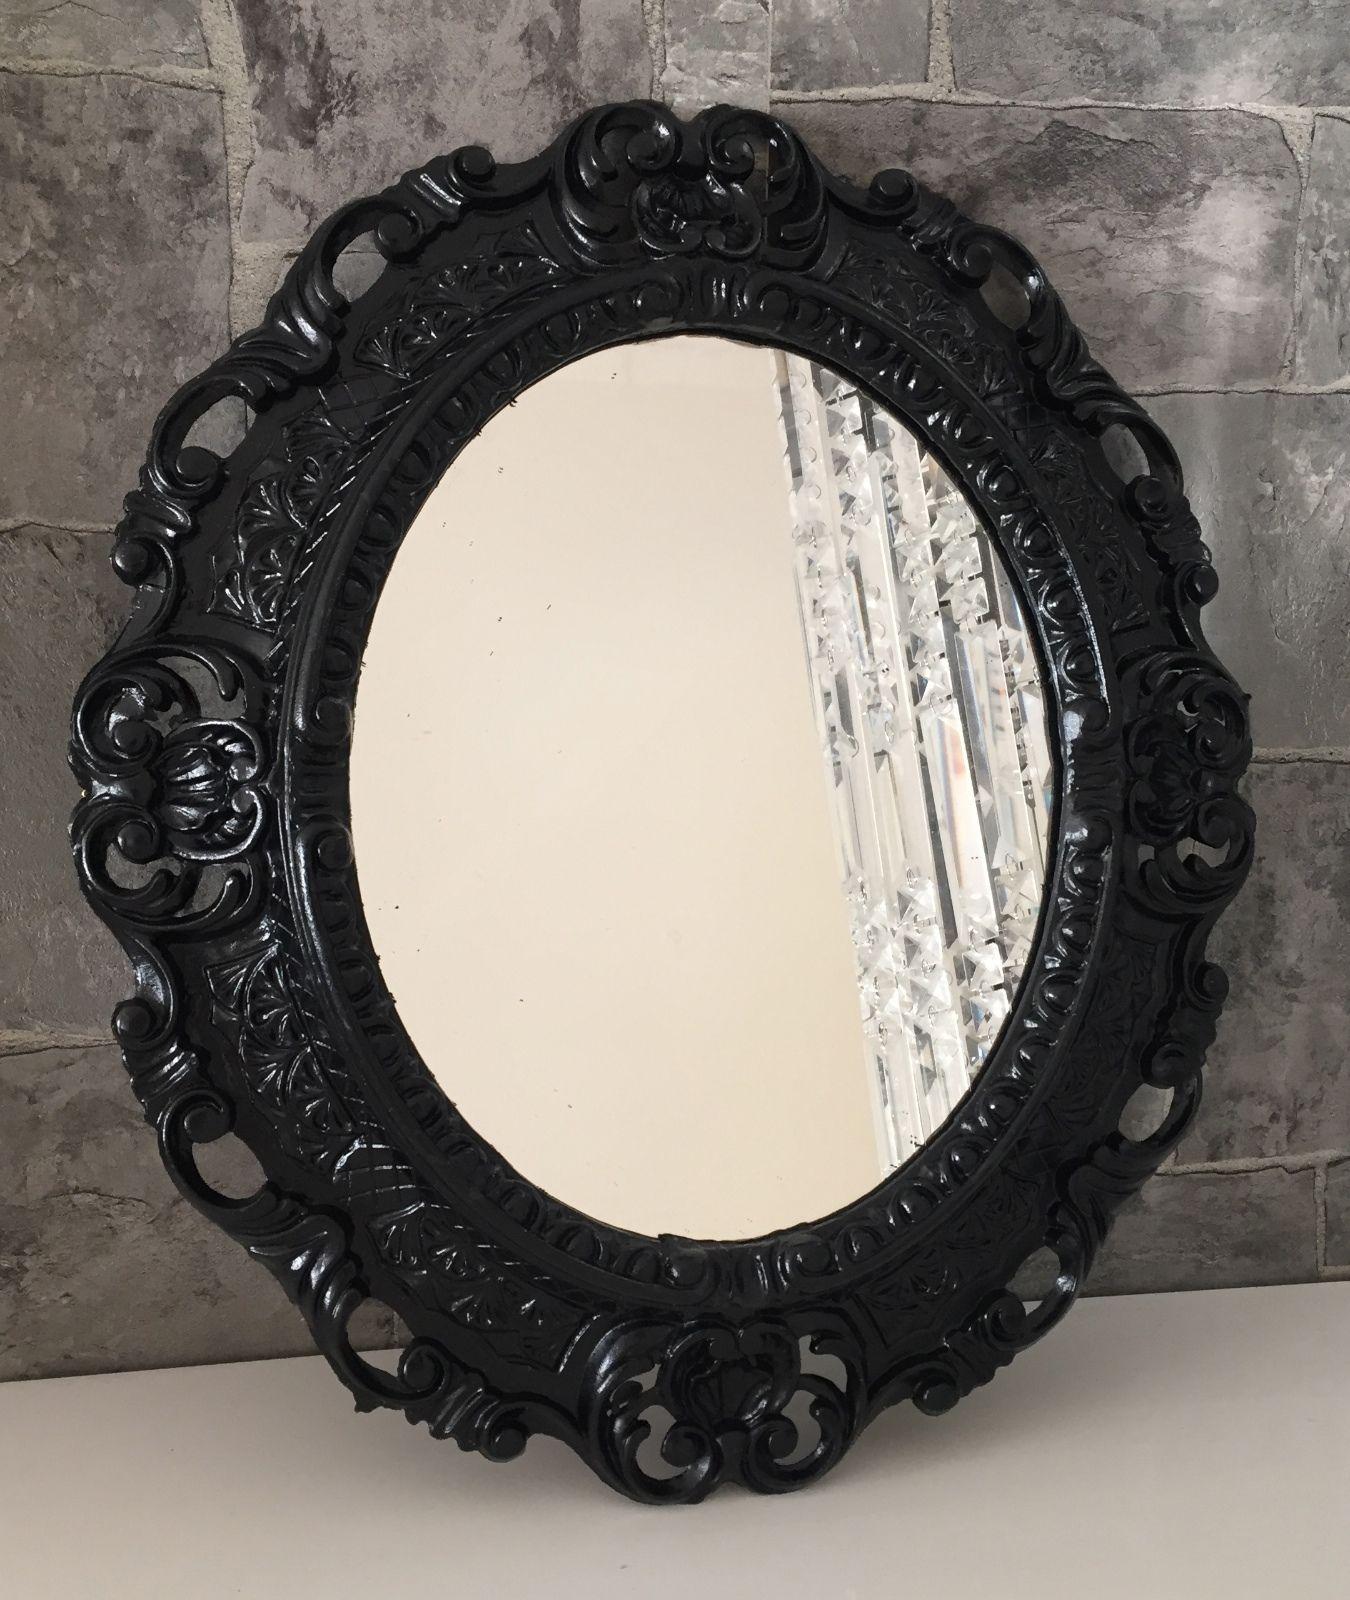 Wandspiegel Schwarz Barock Oval Spiegel Antik 45x38 Bad/Flur ...